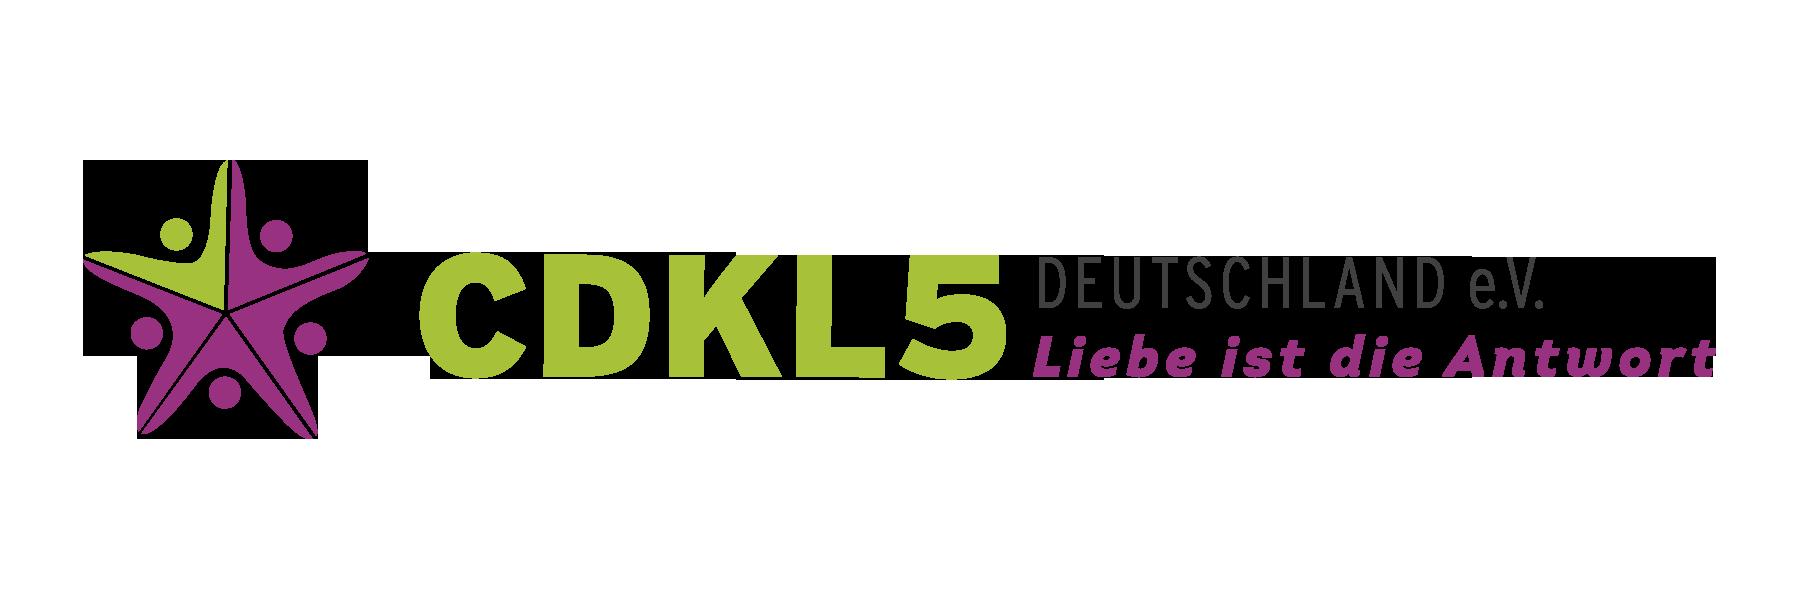 CDKL5 Verein